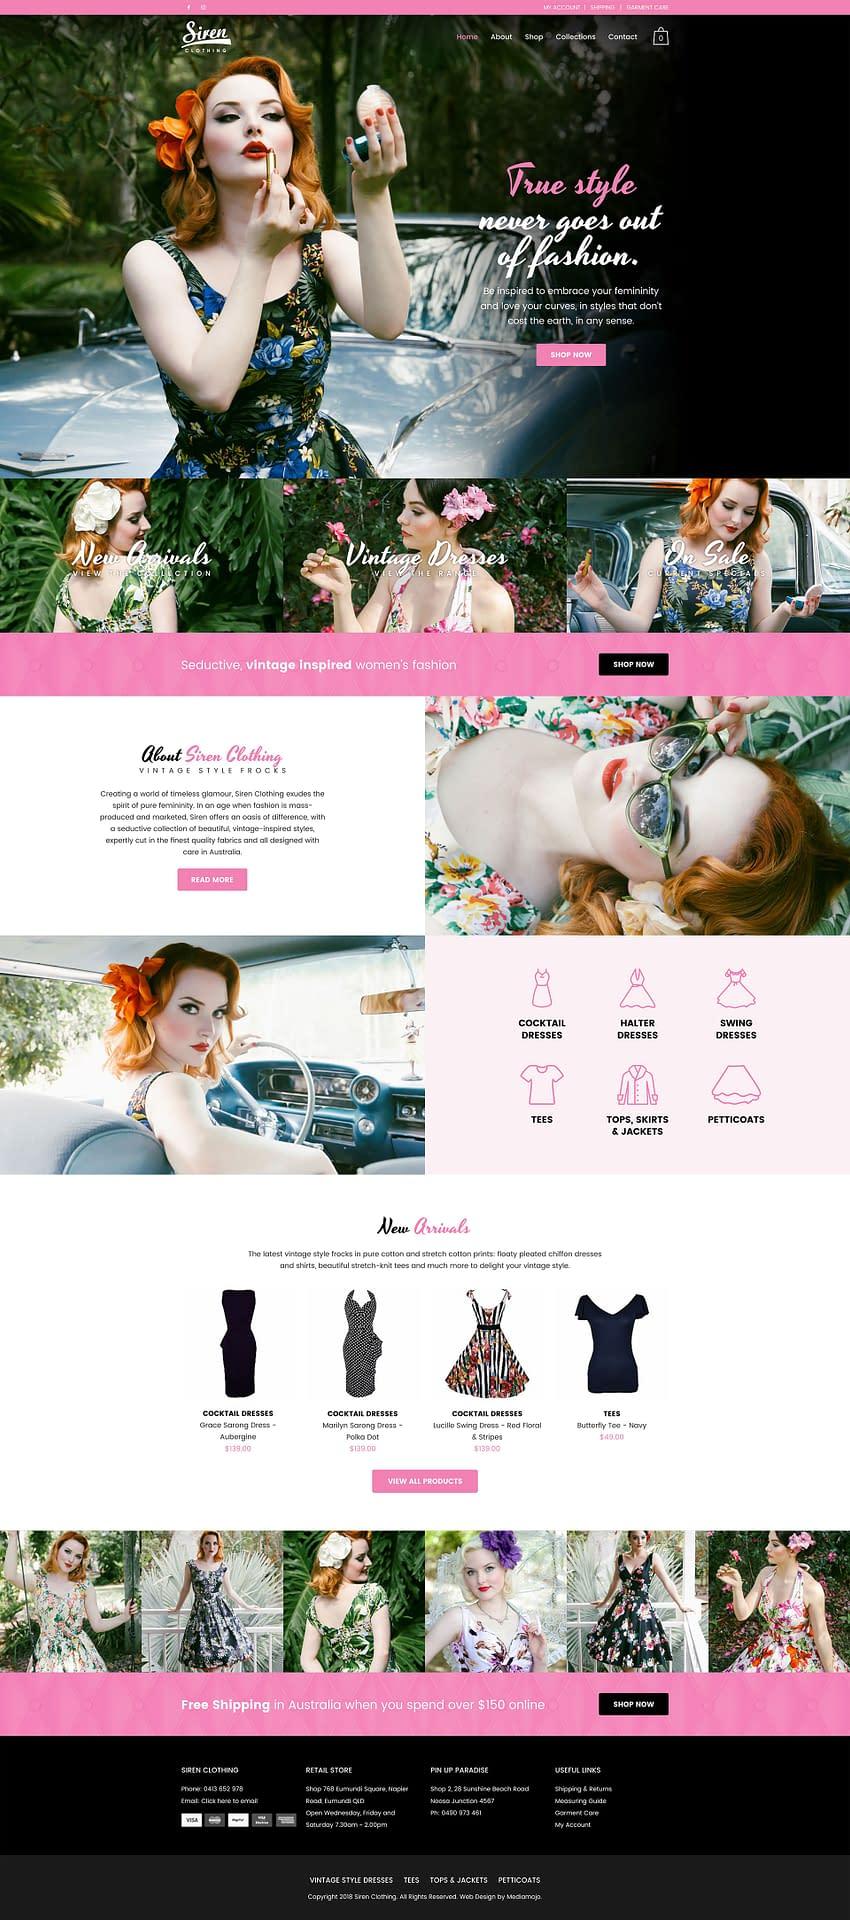 Siren clothing website design